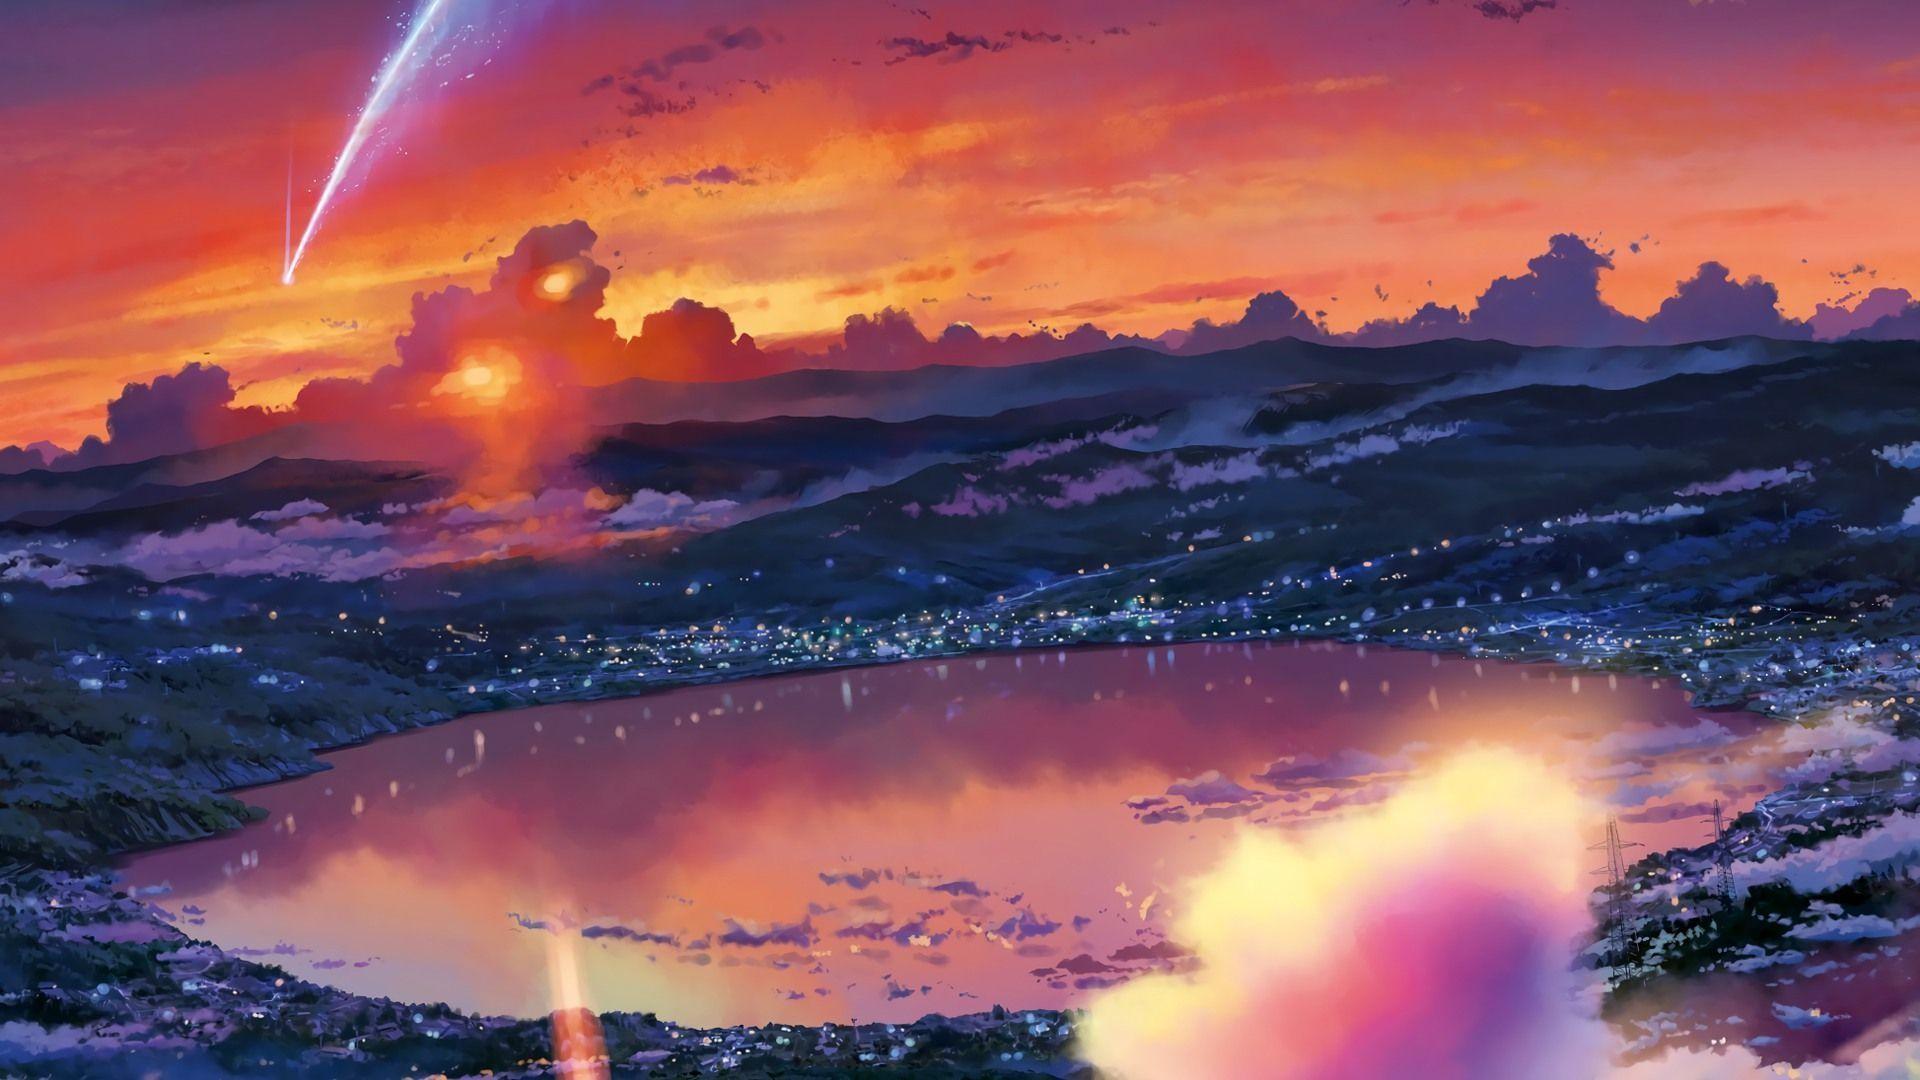 Kimi no na wa wallpapers 74 images - Anime scenery wallpaper laptop ...